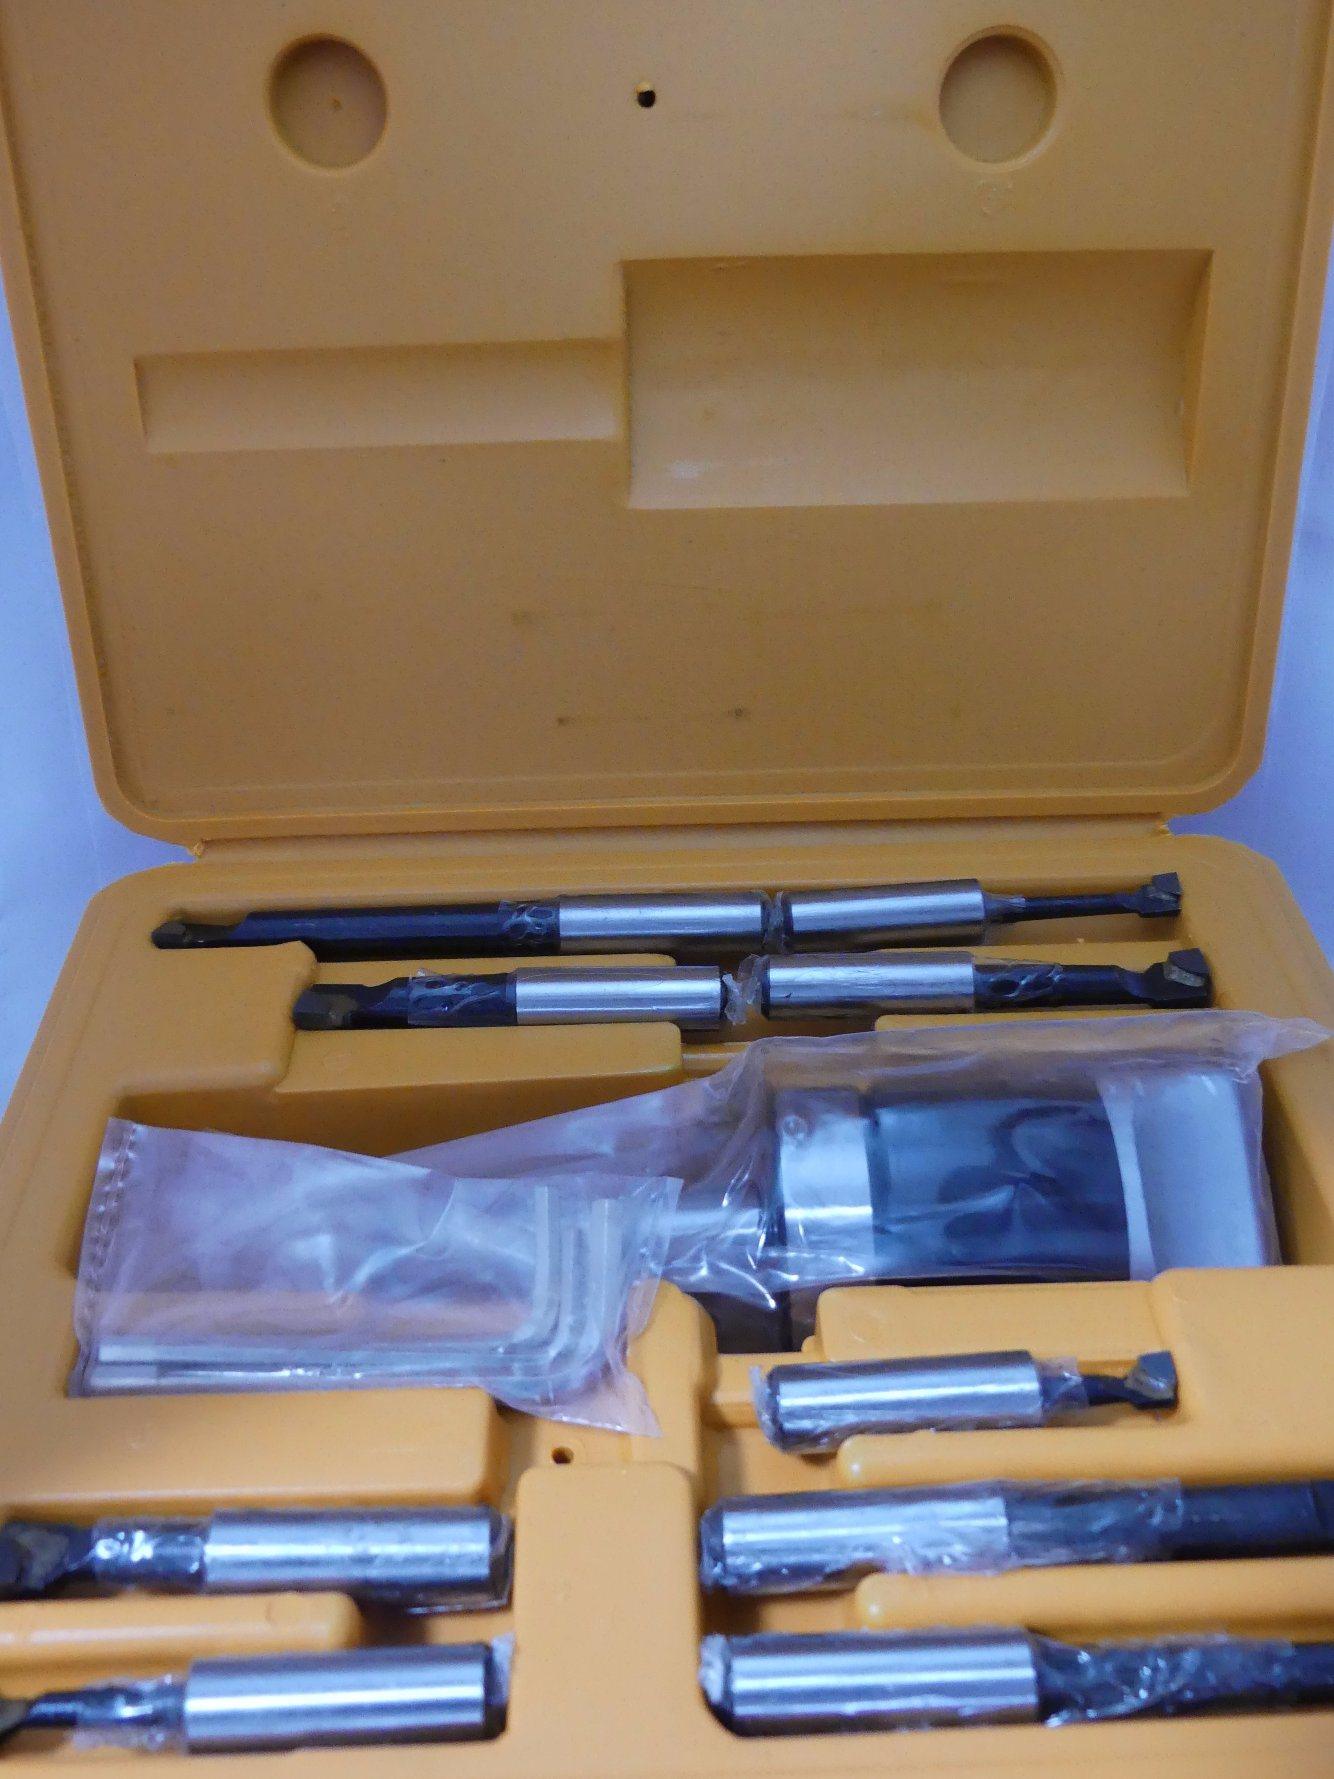 Cutoutil Boring Head F1-50mm Set Boring Bar Head with Shank Mt3 for CNC Machine Boring Head Set